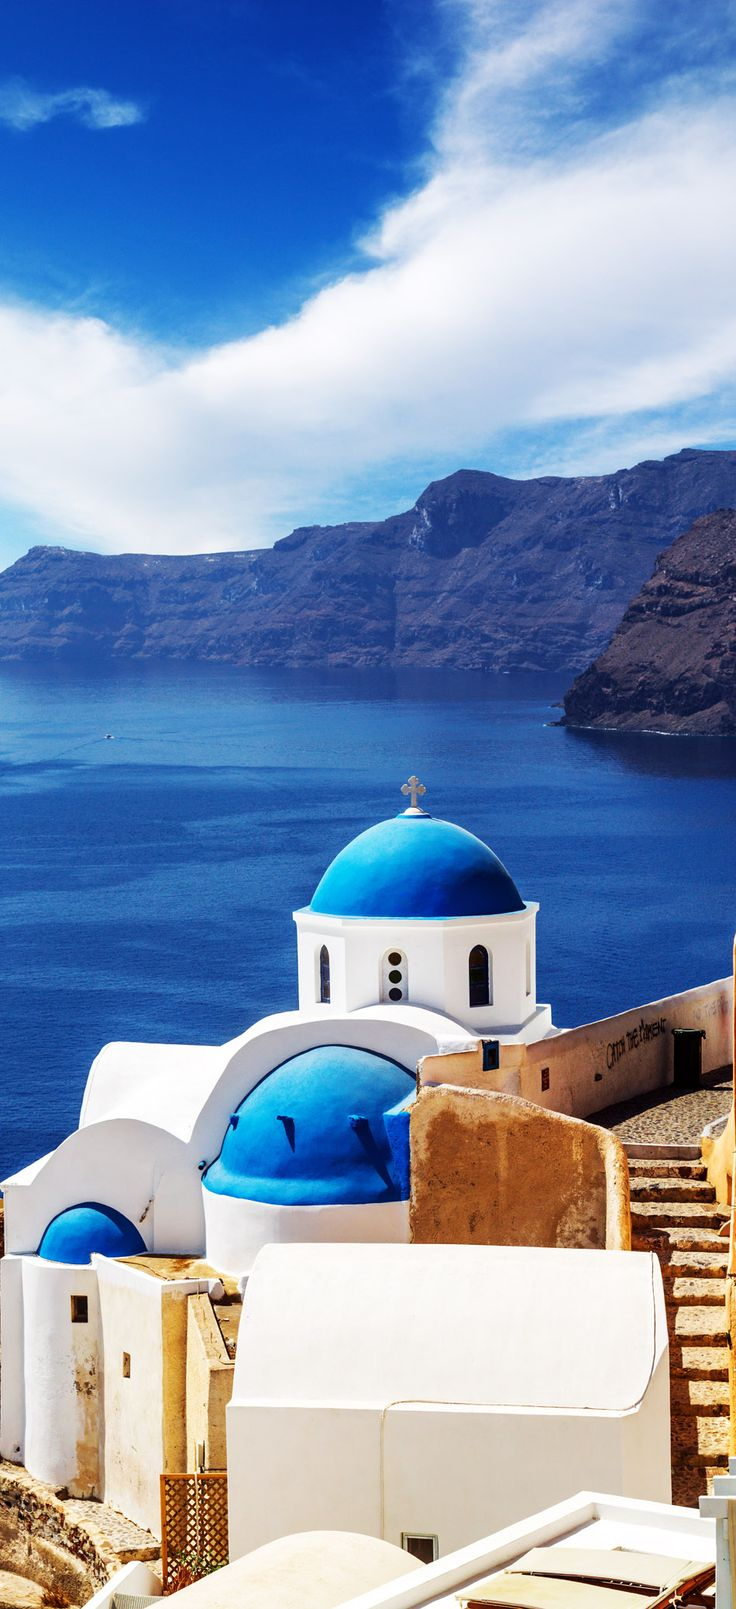 Churches of Oia village under puffy clouds, Santorini island, Greece | 10 Breathtaking Photos of World's Most Romantic Island